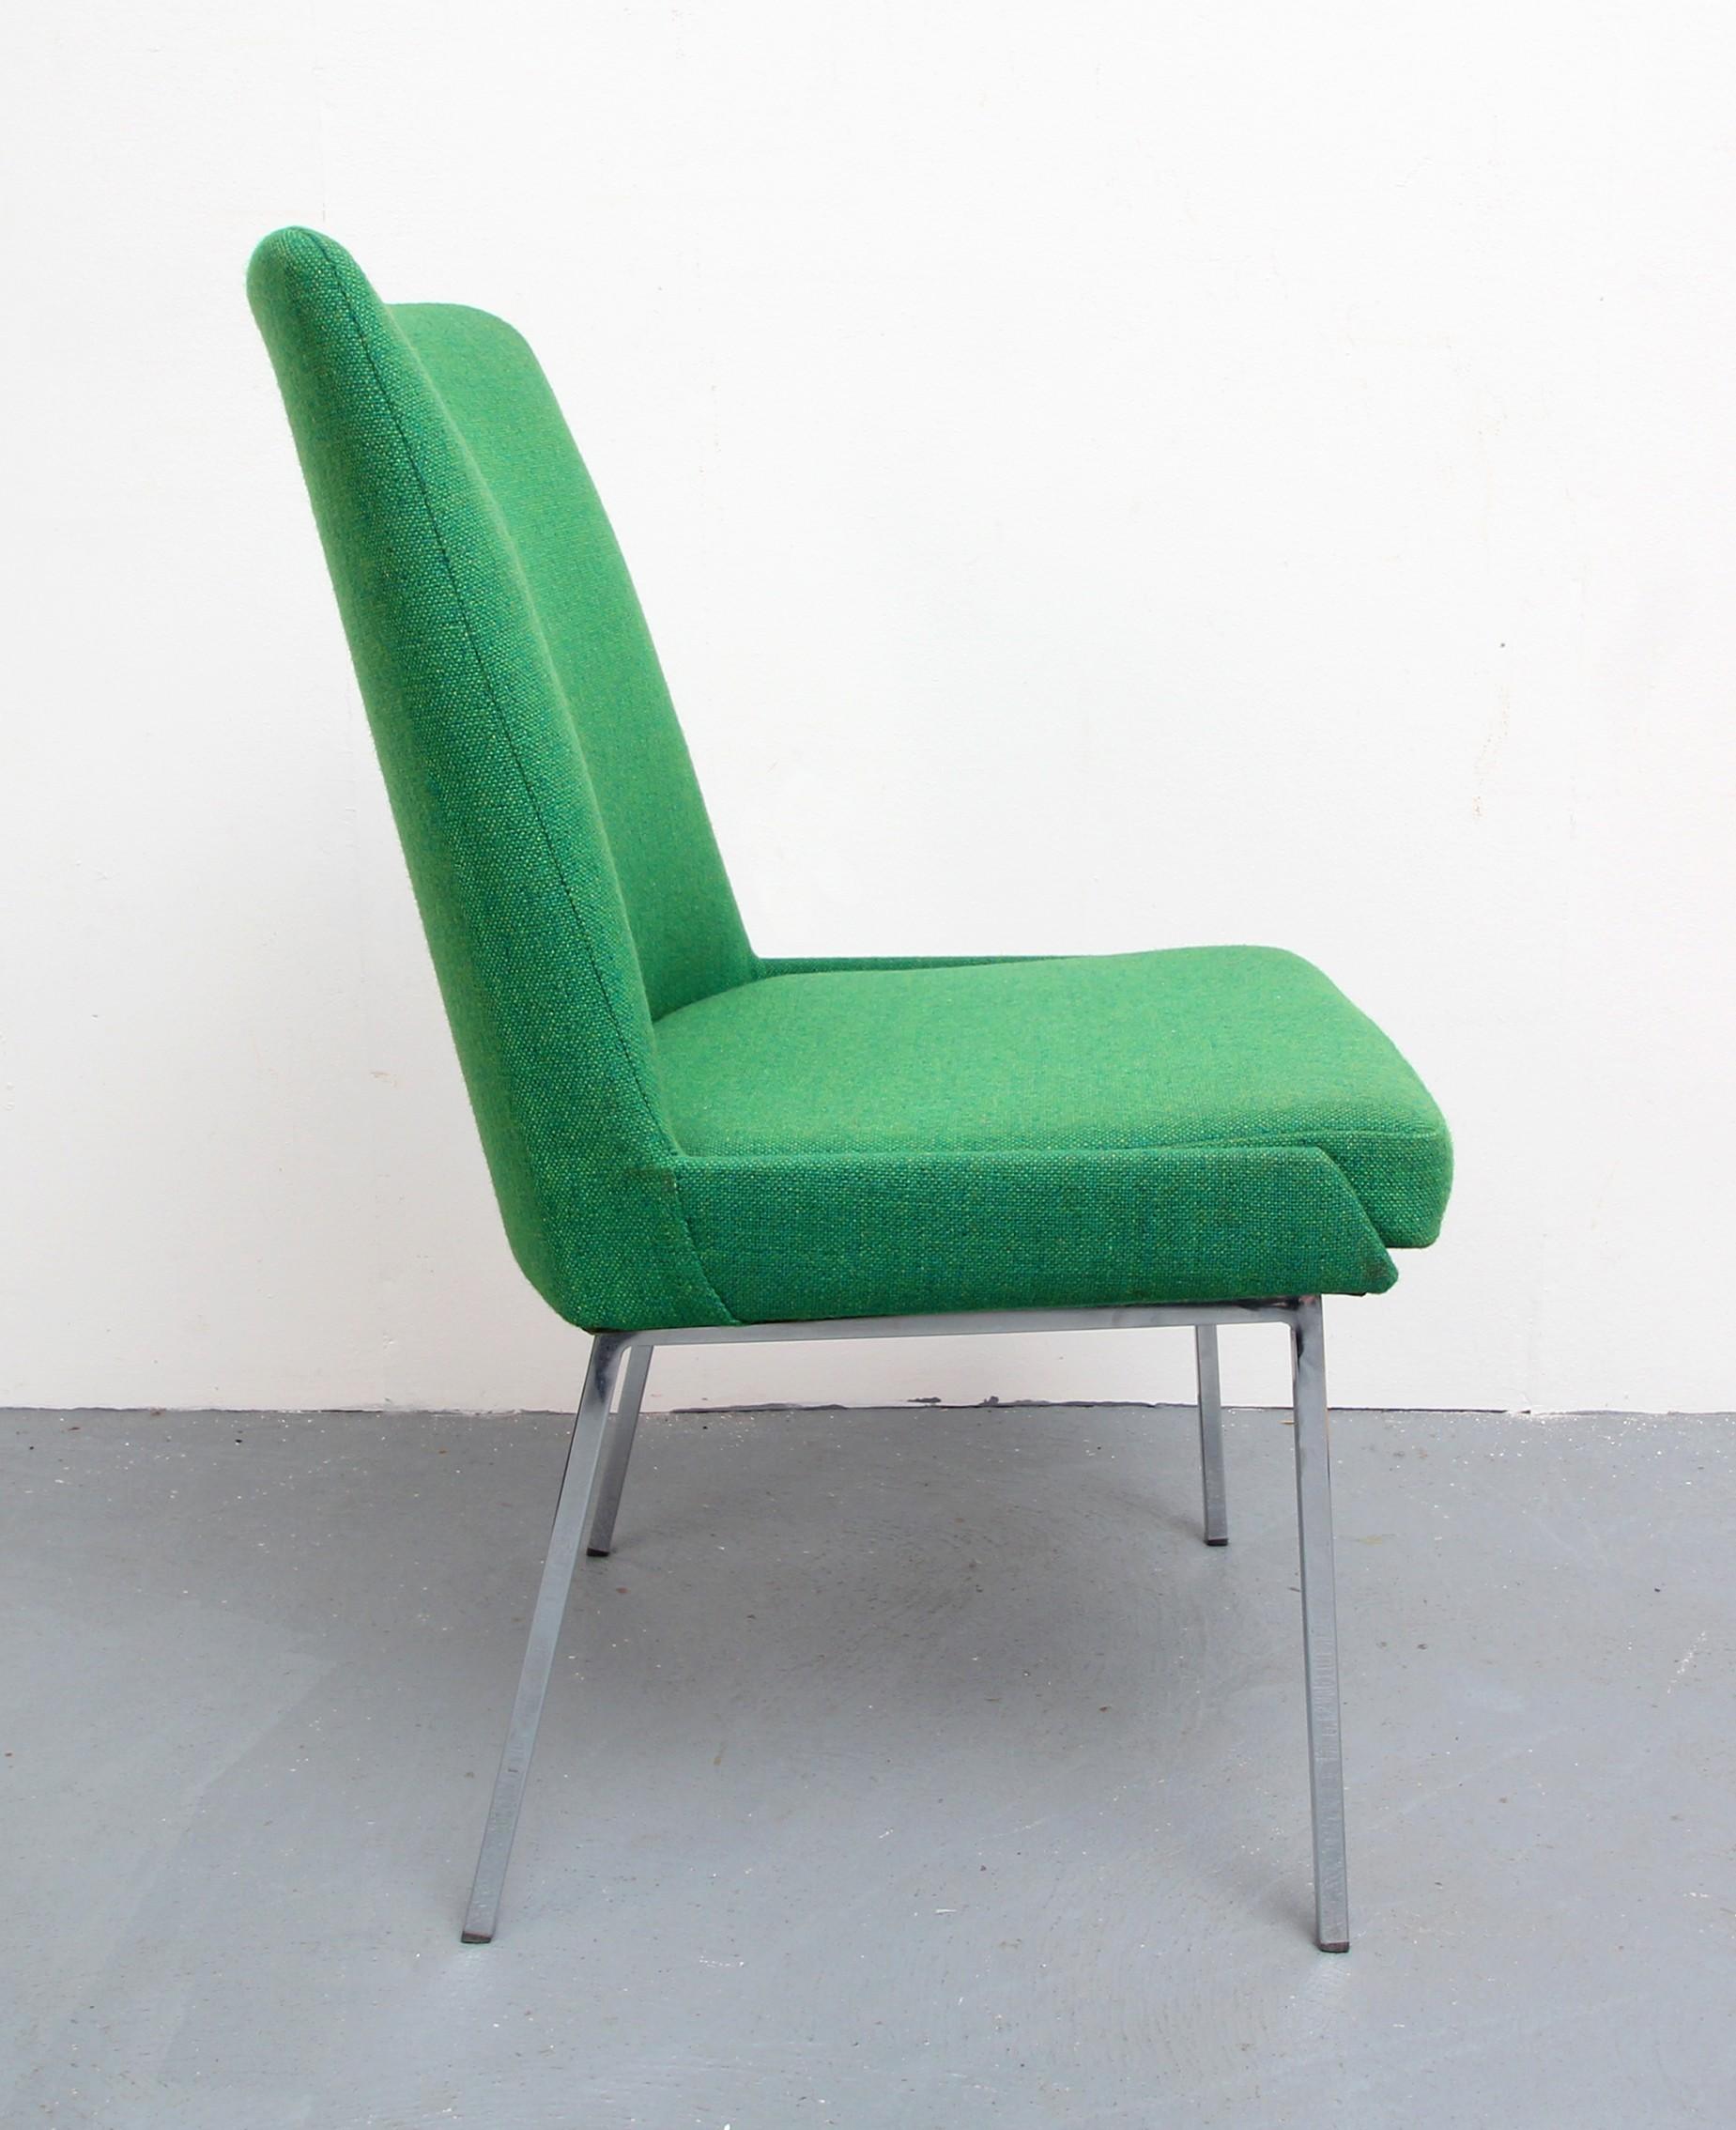 Vintage German Green Chair from Mauser - 1960s. Previous Next & Vintage German Green Chair from Mauser - 1960s - Design Market